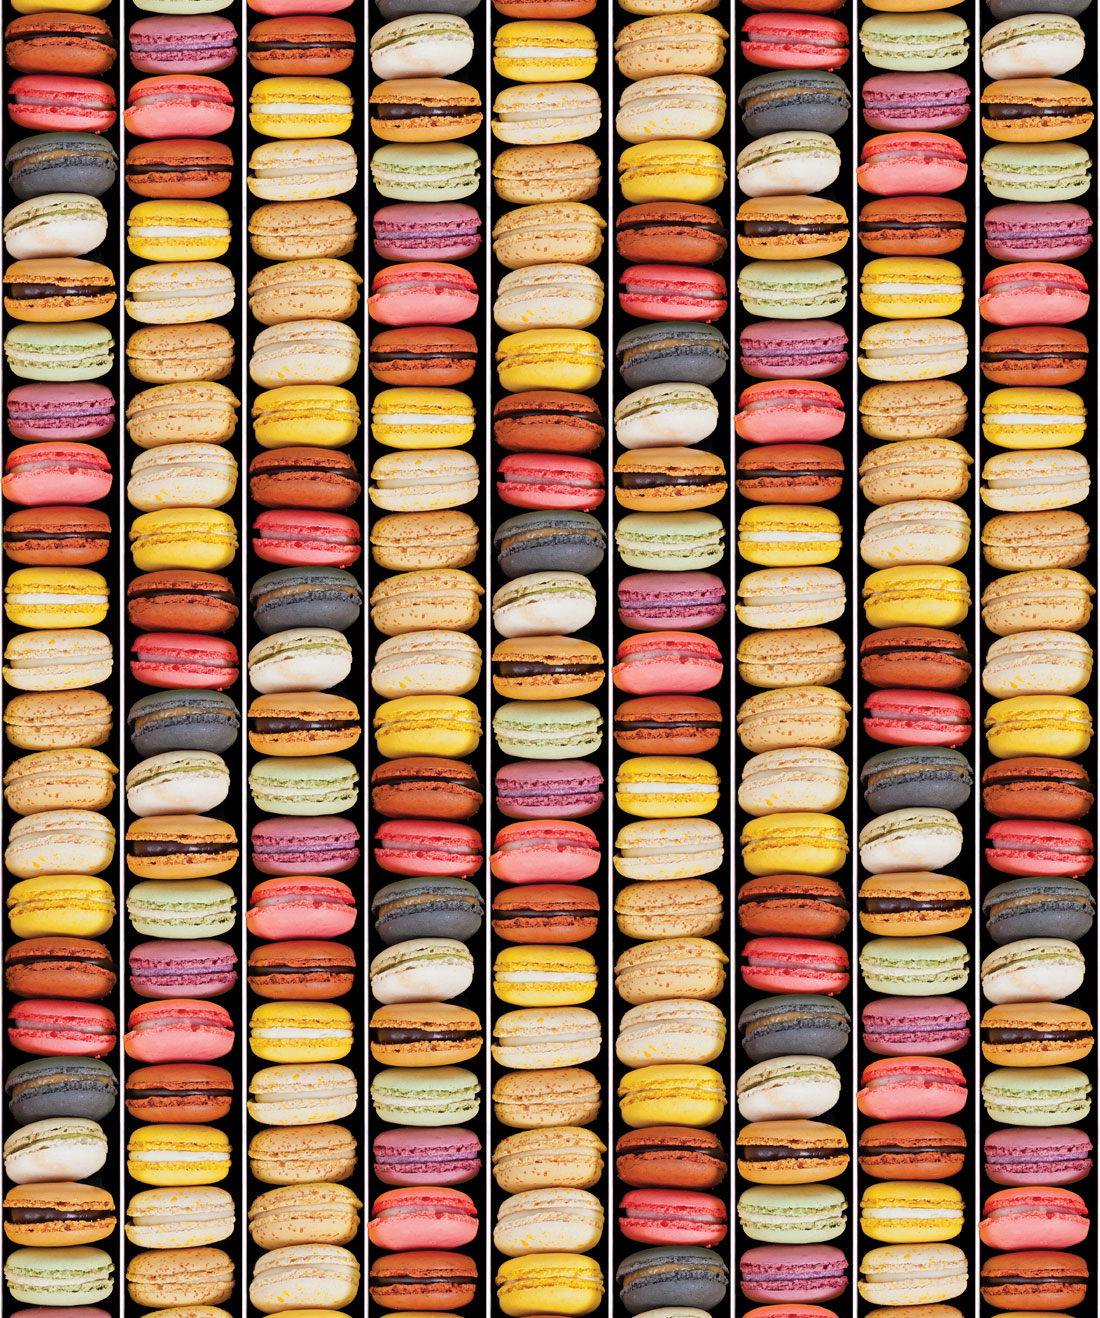 Macaroons Wallpaper